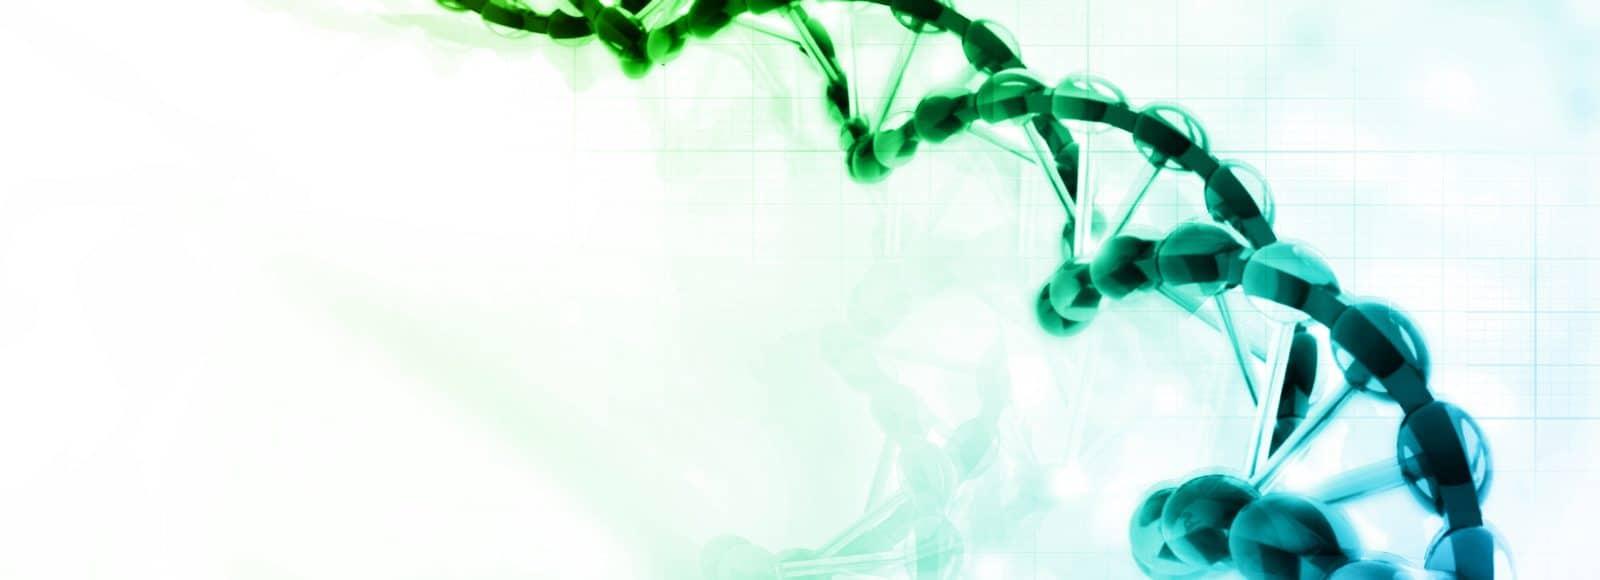 NBS Scientific stock photo